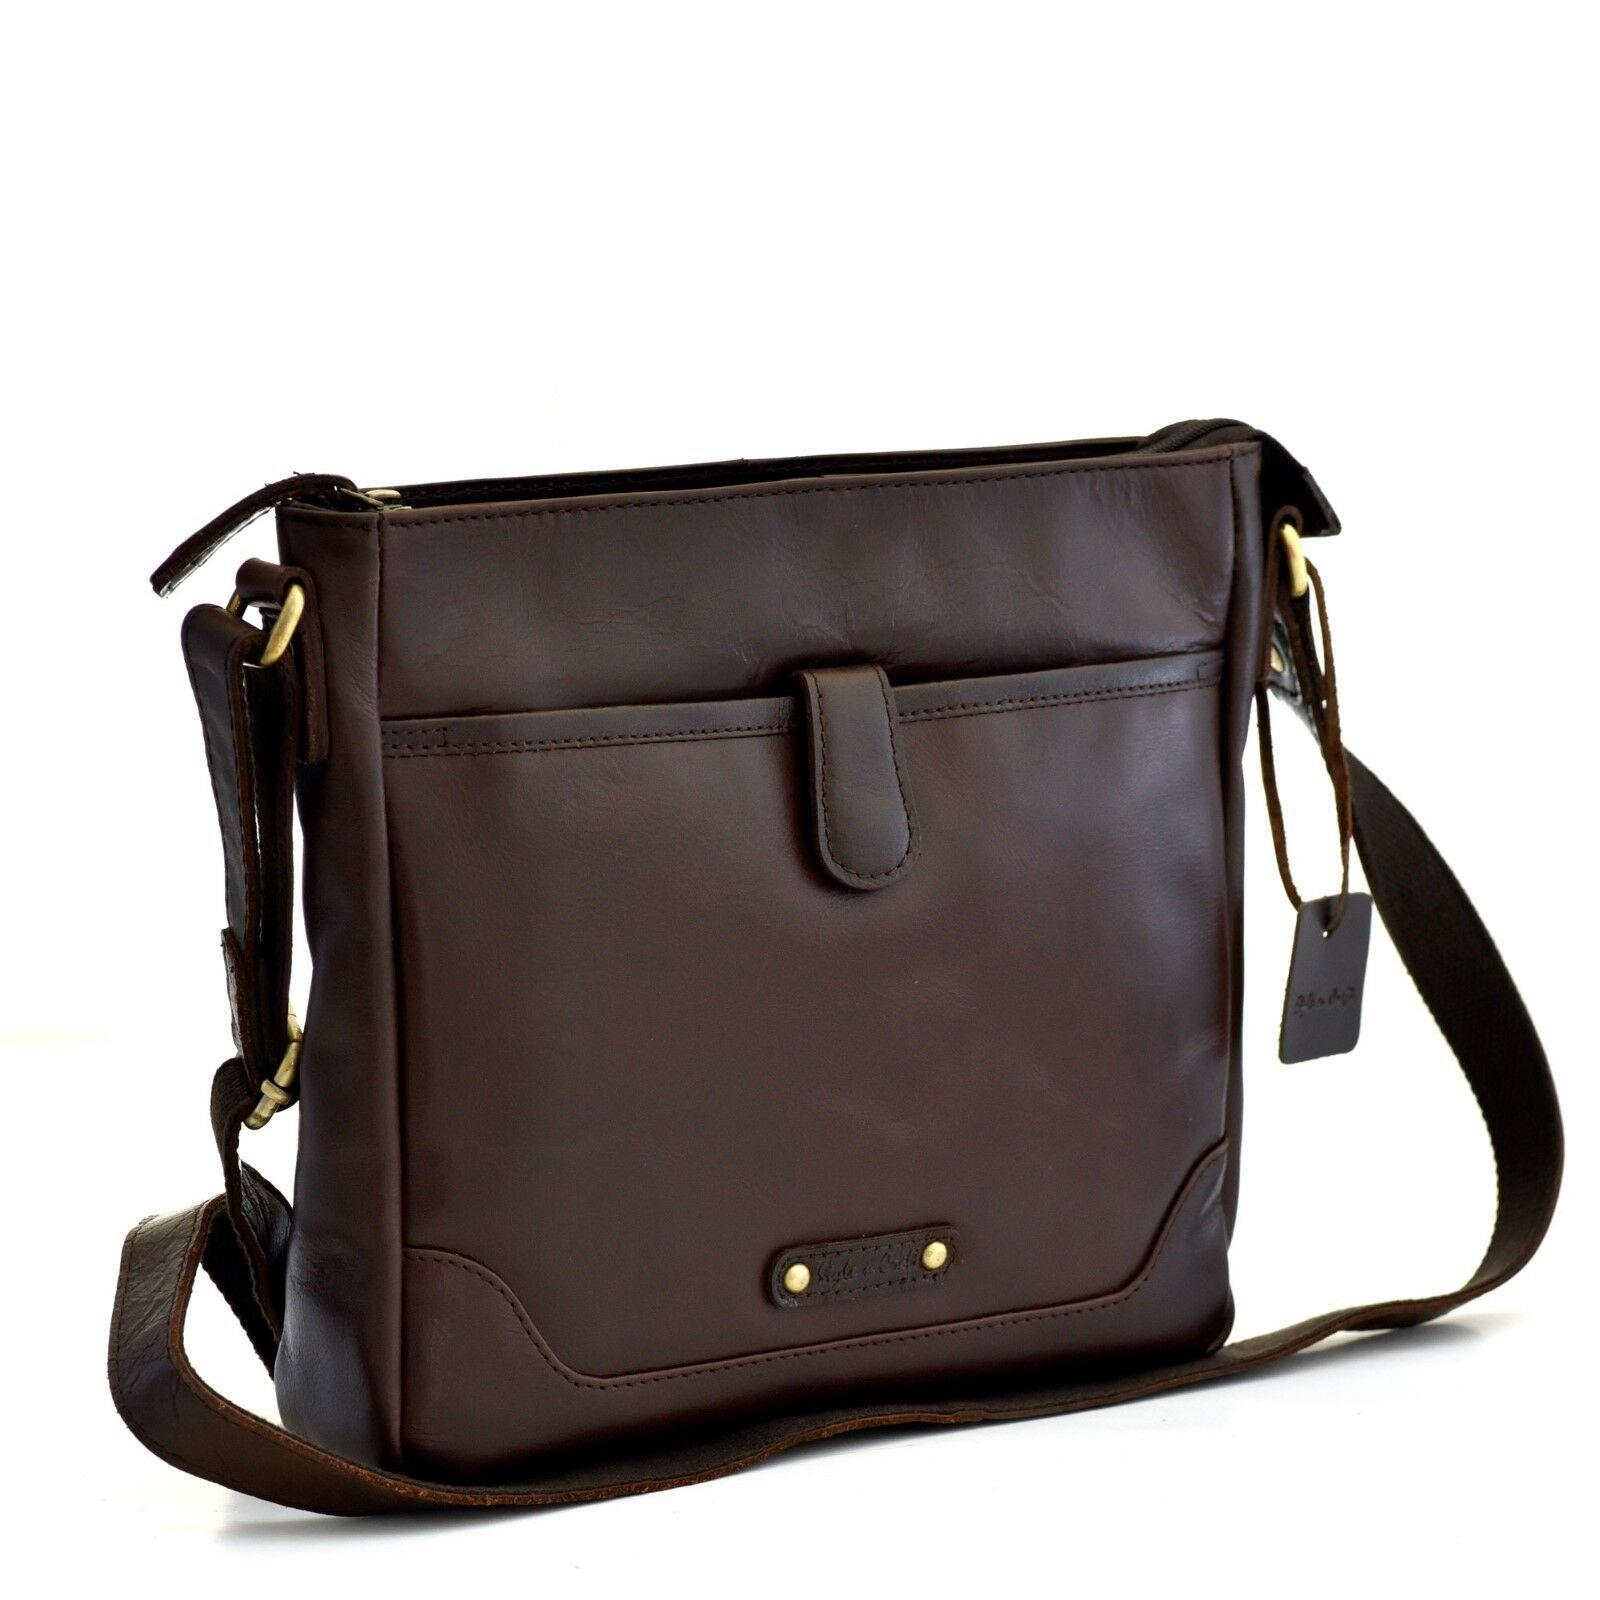 Unisexe Sac Messenger Small Cross Body épaule Nylon Bag Black